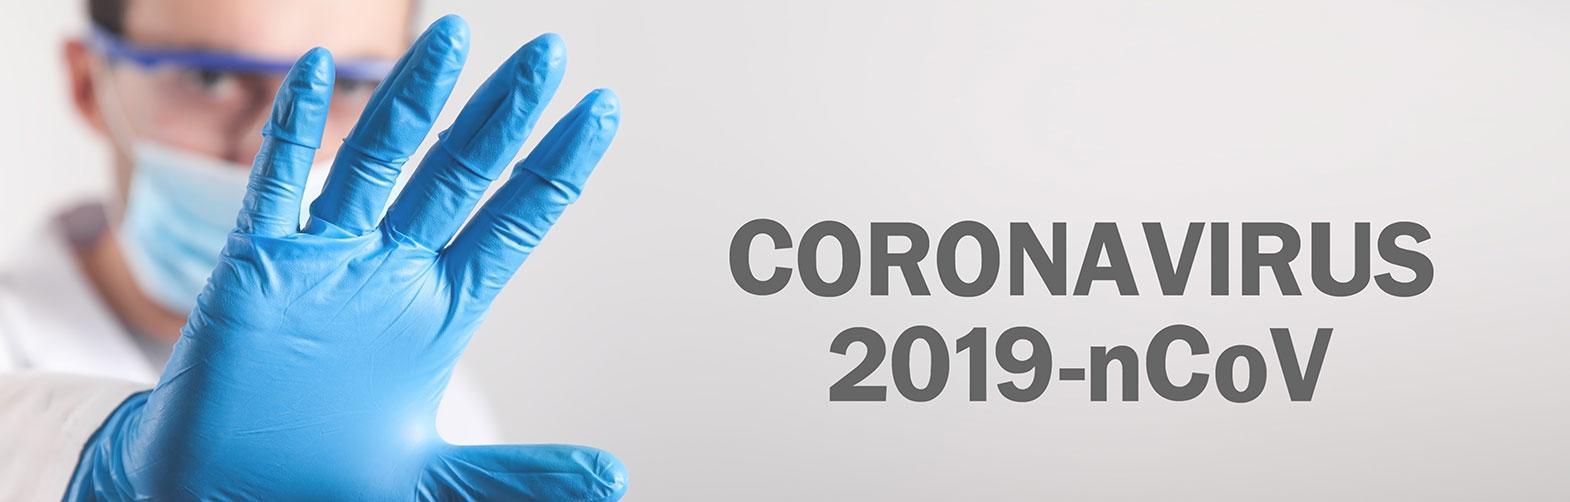 banner-homepage-corona.jpg